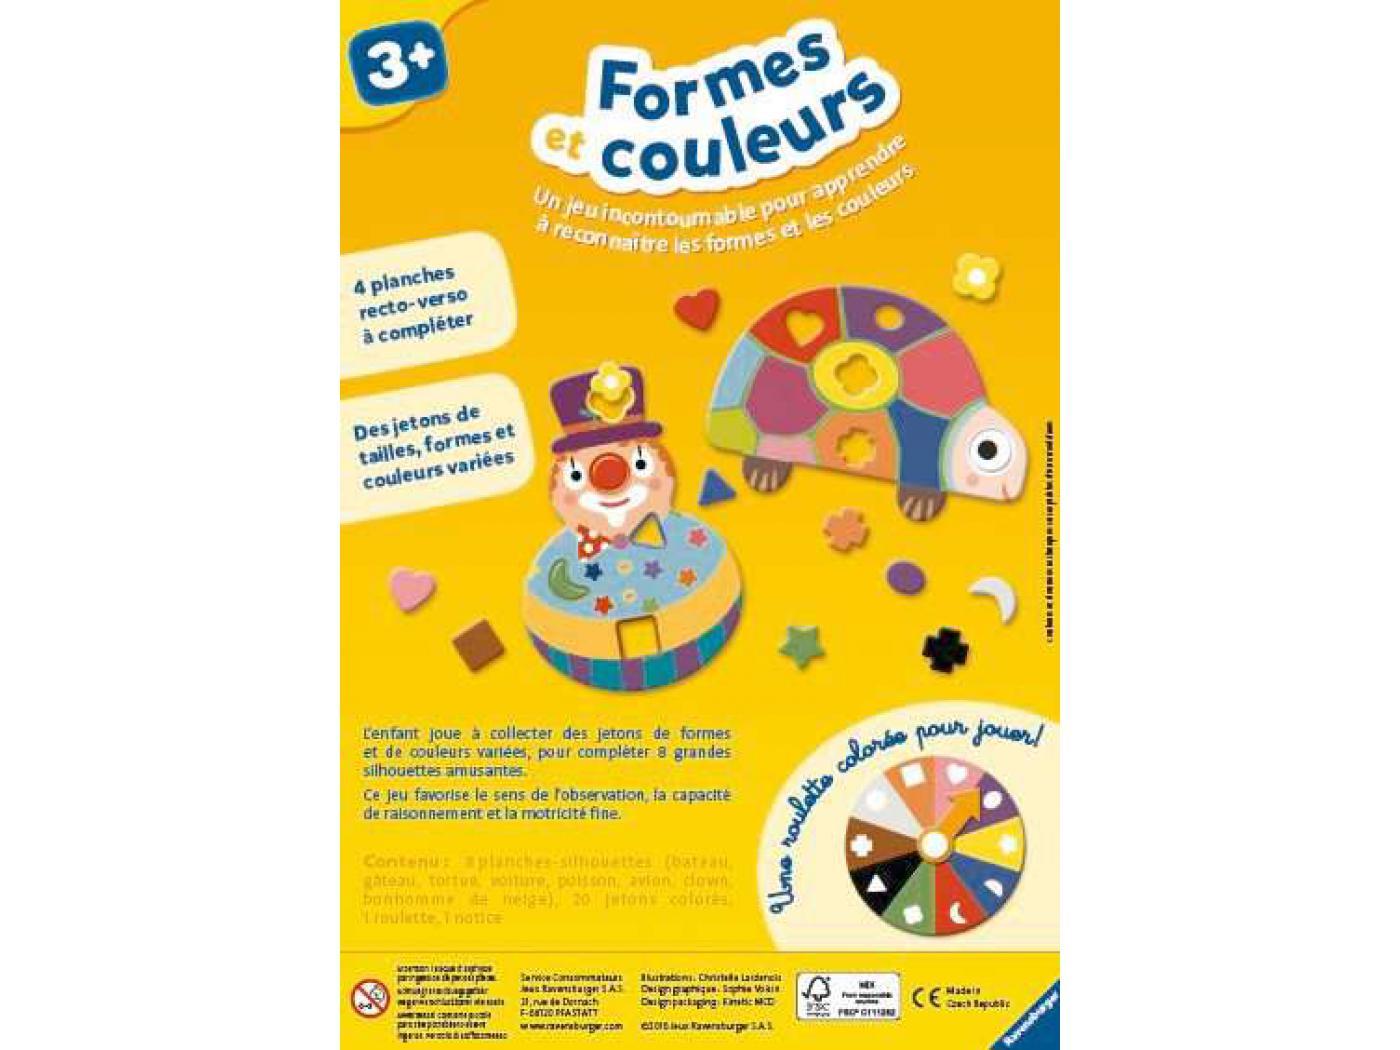 ravensburger formes et couleurs jeux ducatifs 3 ans. Black Bedroom Furniture Sets. Home Design Ideas